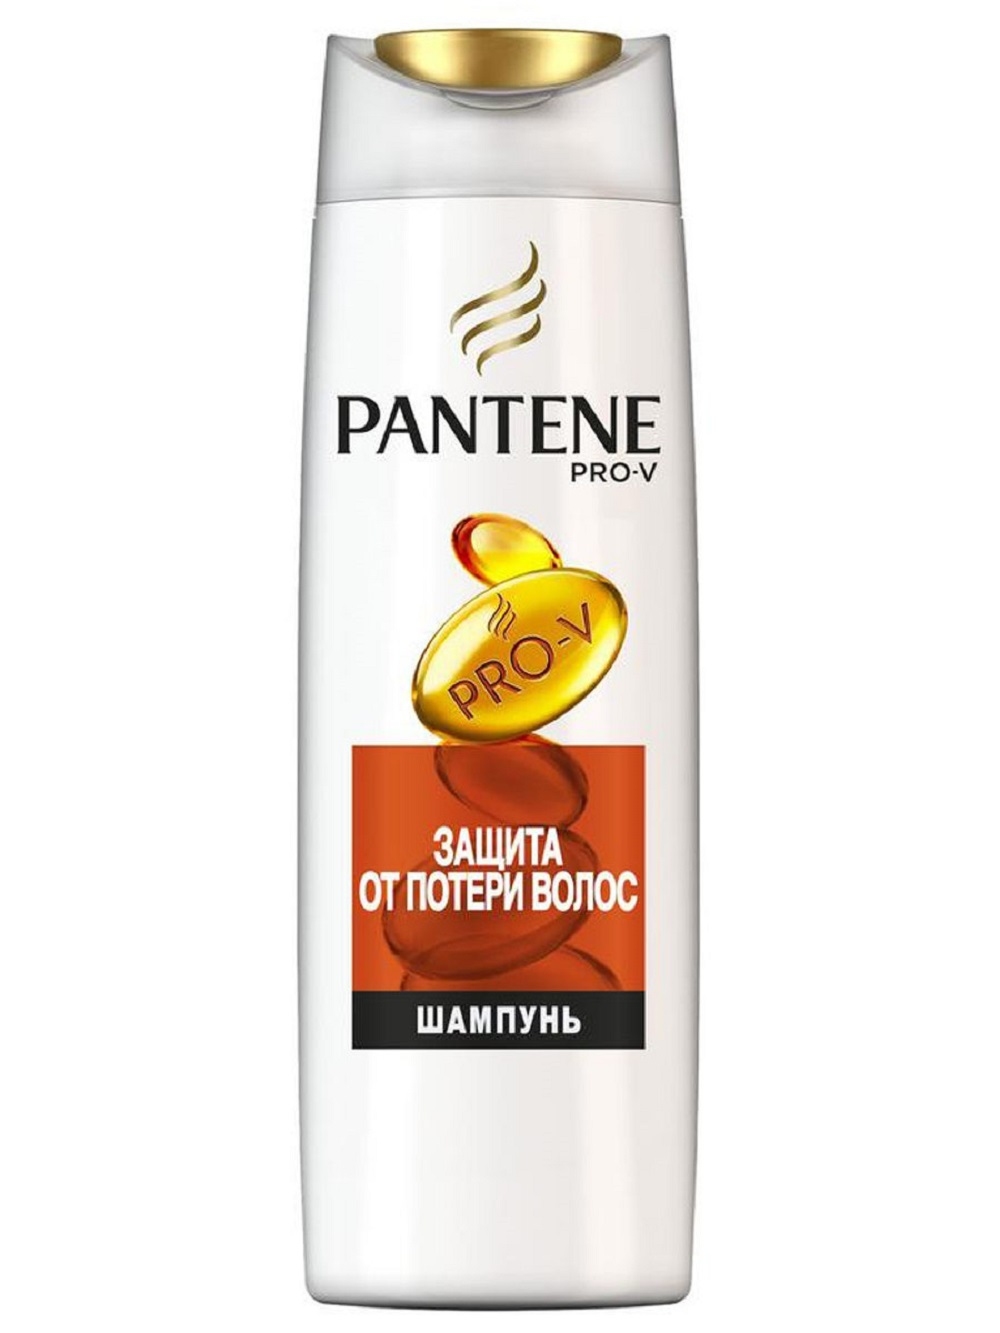 Pantene шампунь «Защита от потери волос» (Anti Hair Fall)